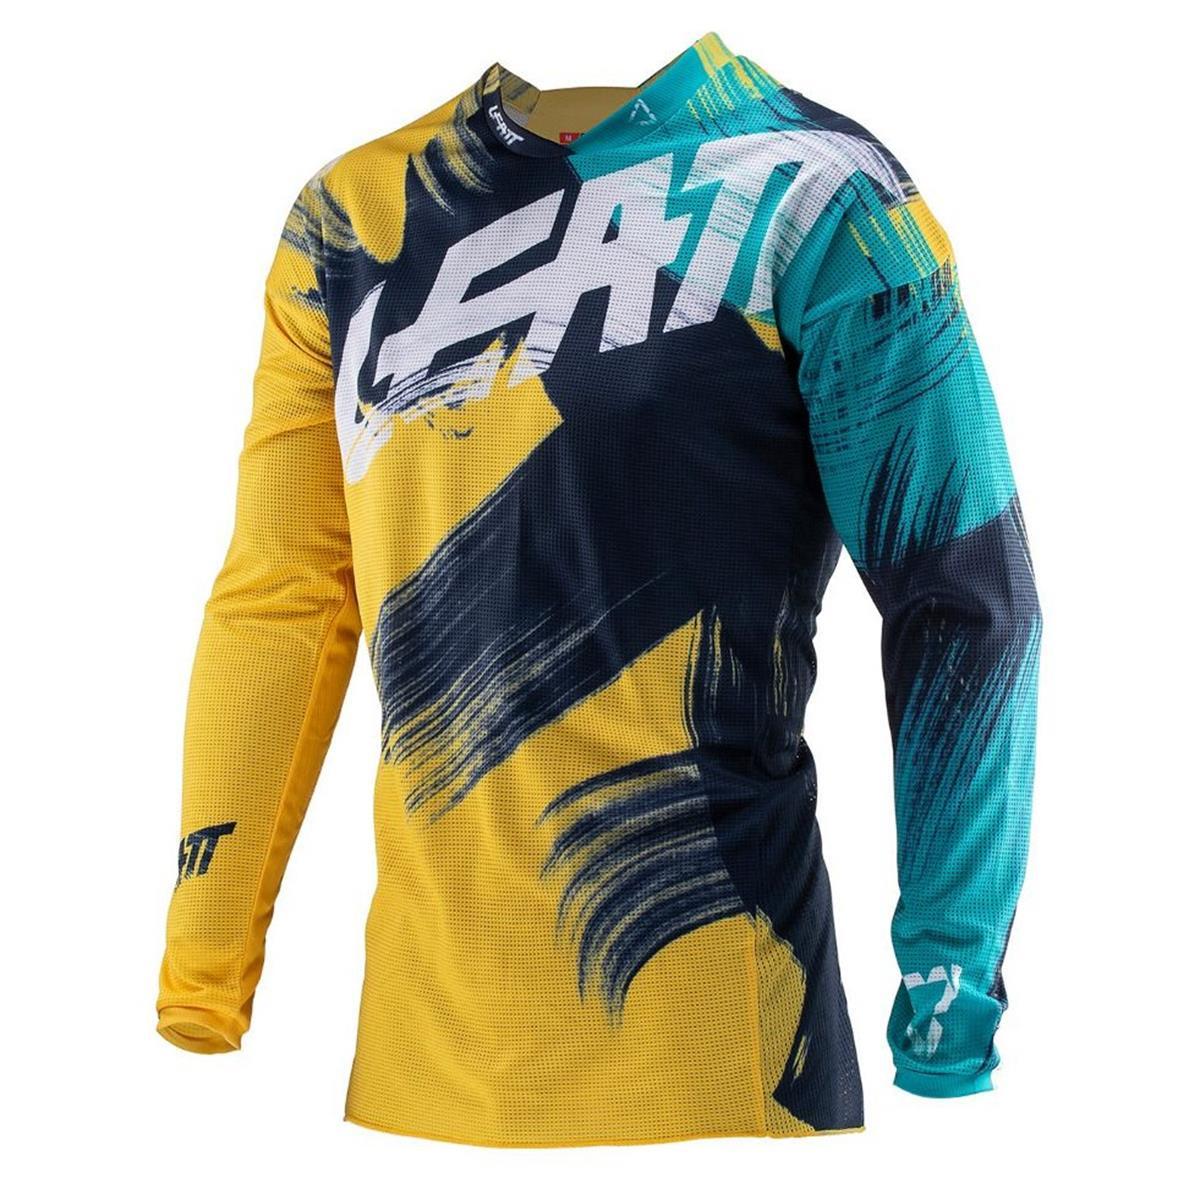 Leatt Jersey GPX 4.5 Lite Gold/Teal